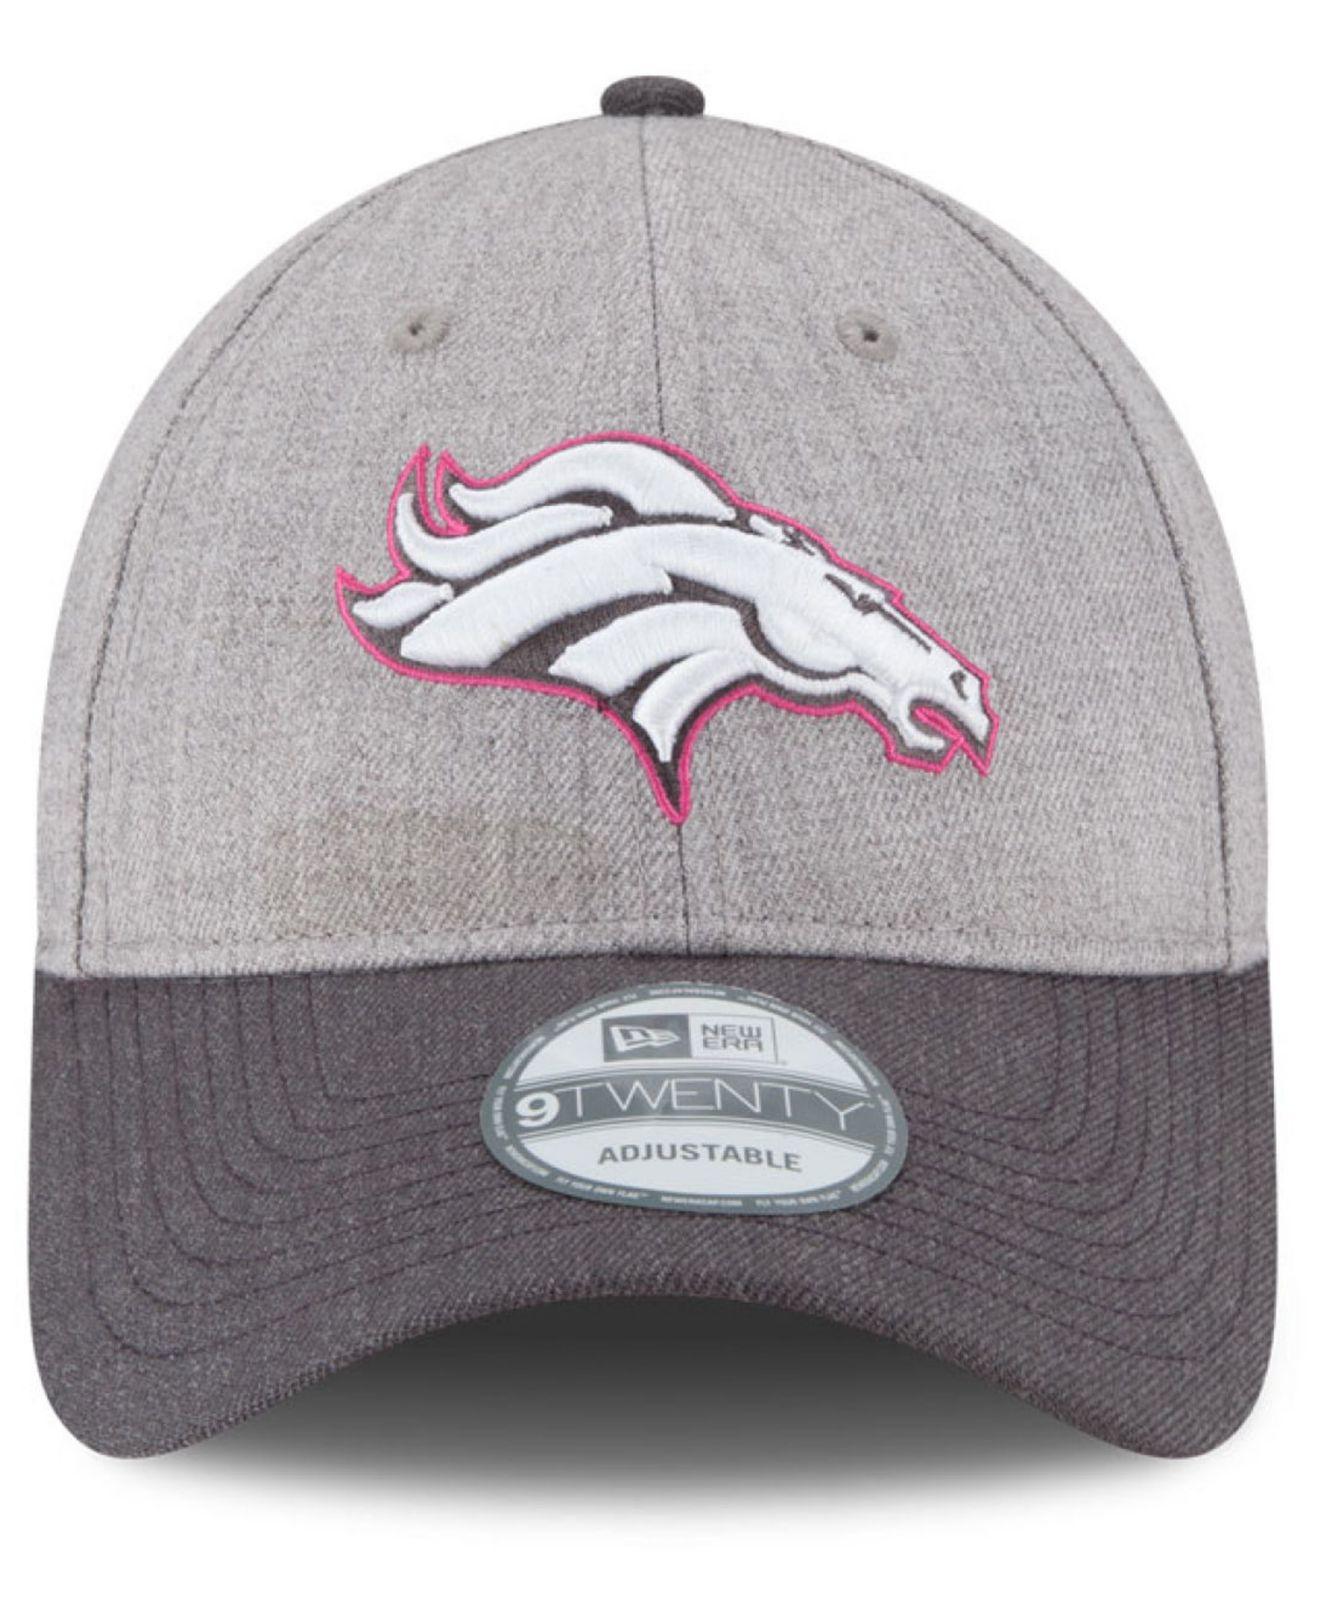 Broncos Breast Cancer Hat - Hat HD Image Ukjugs.Org fbd4c9006